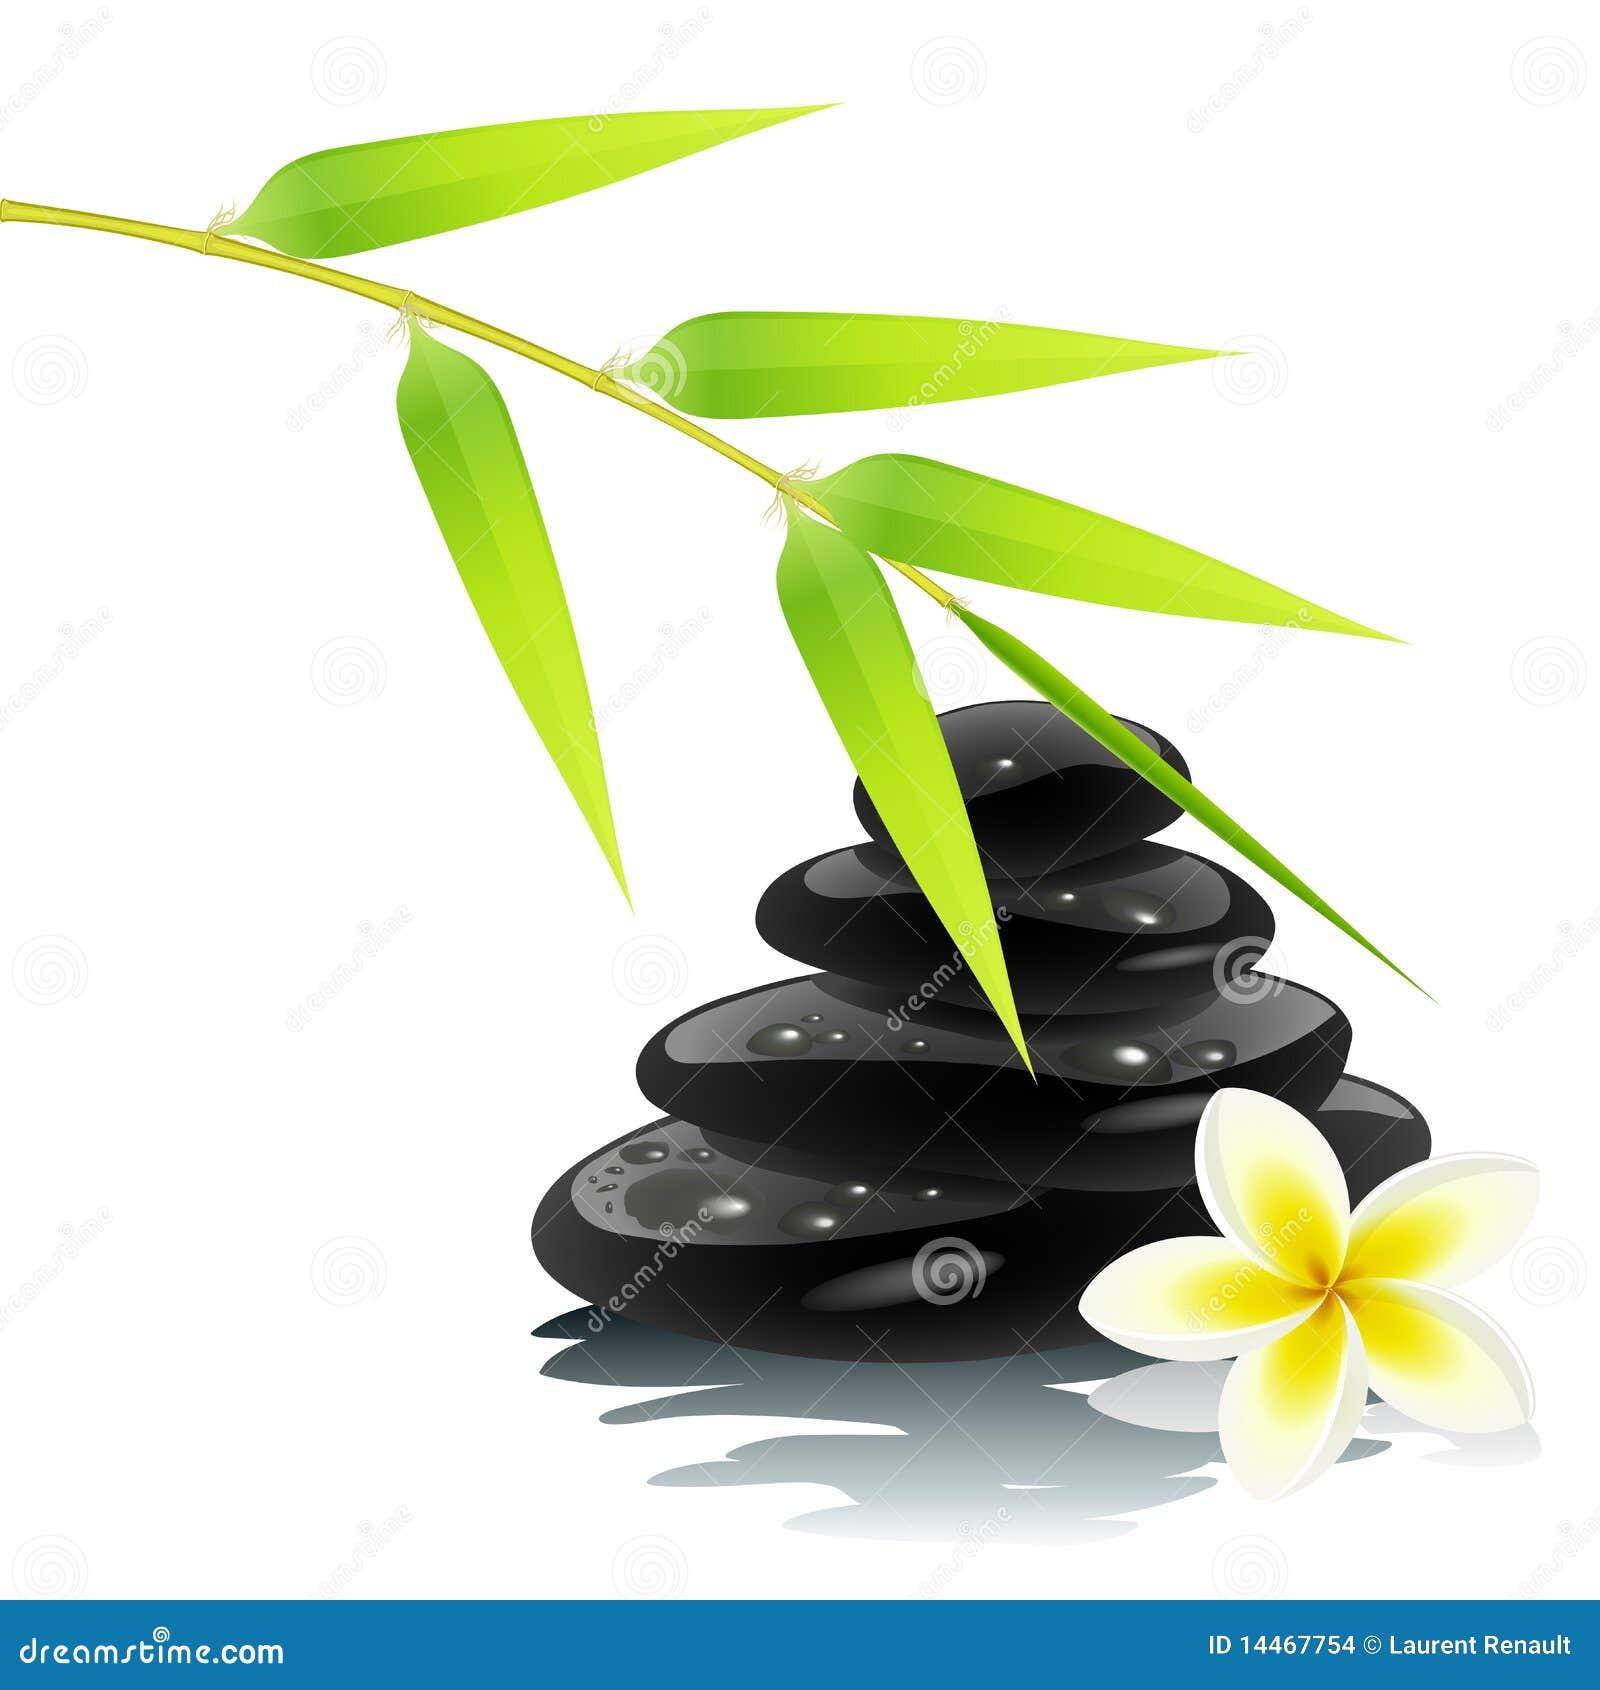 Zen ambiance stock images image 14467754 - Toilette ambiance zen ...